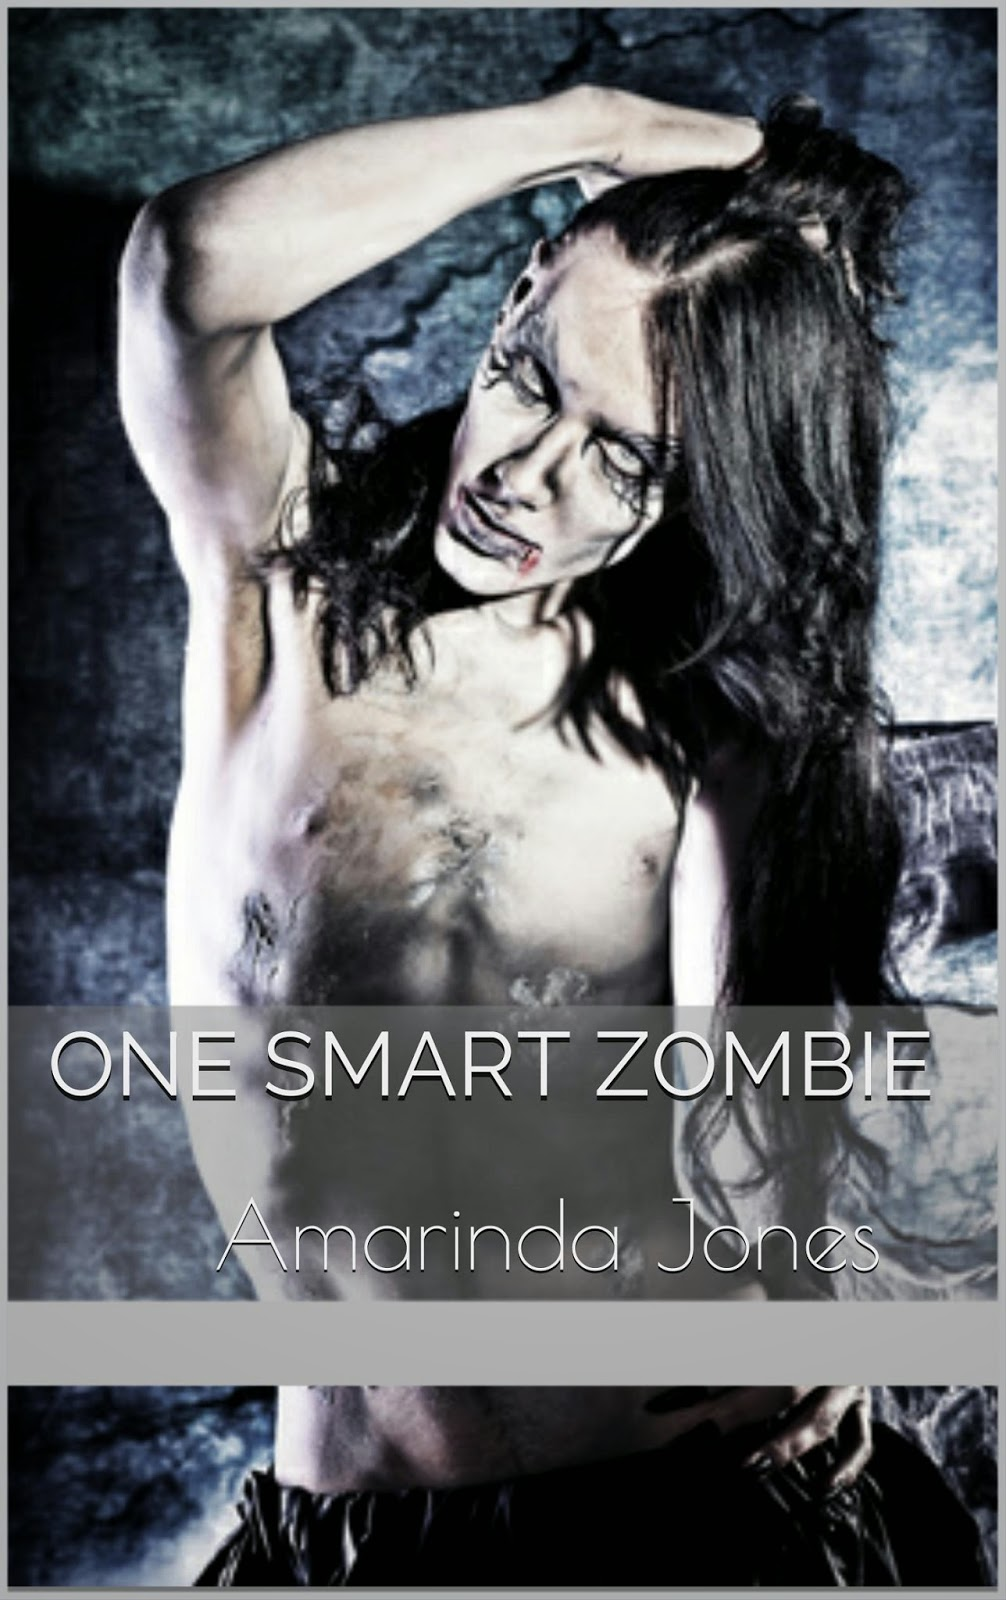 https://www.allromanceebooks.com/product-onesmartzombie-1485495-140.html